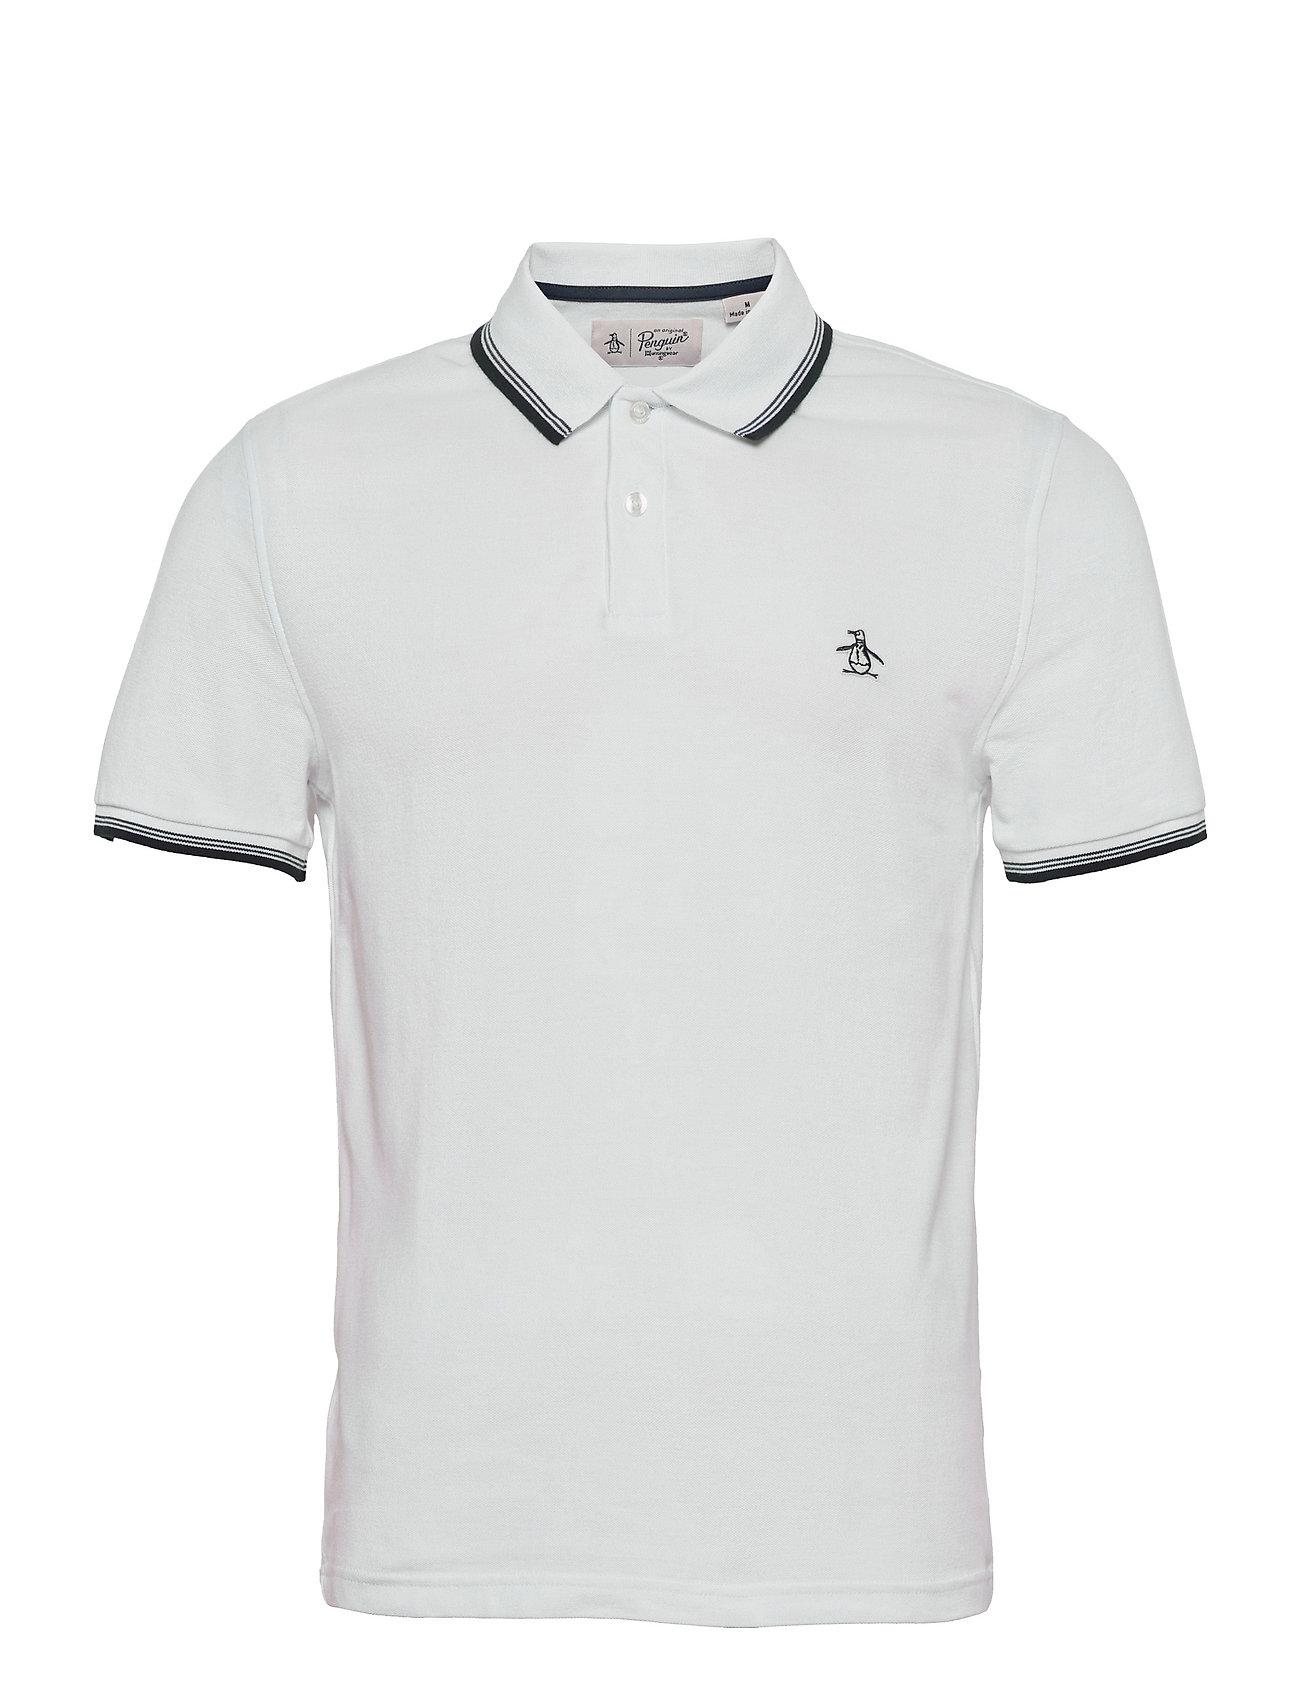 Tipped Collar Polo Shirt Polos Short-sleeved Hvid Original Penguin